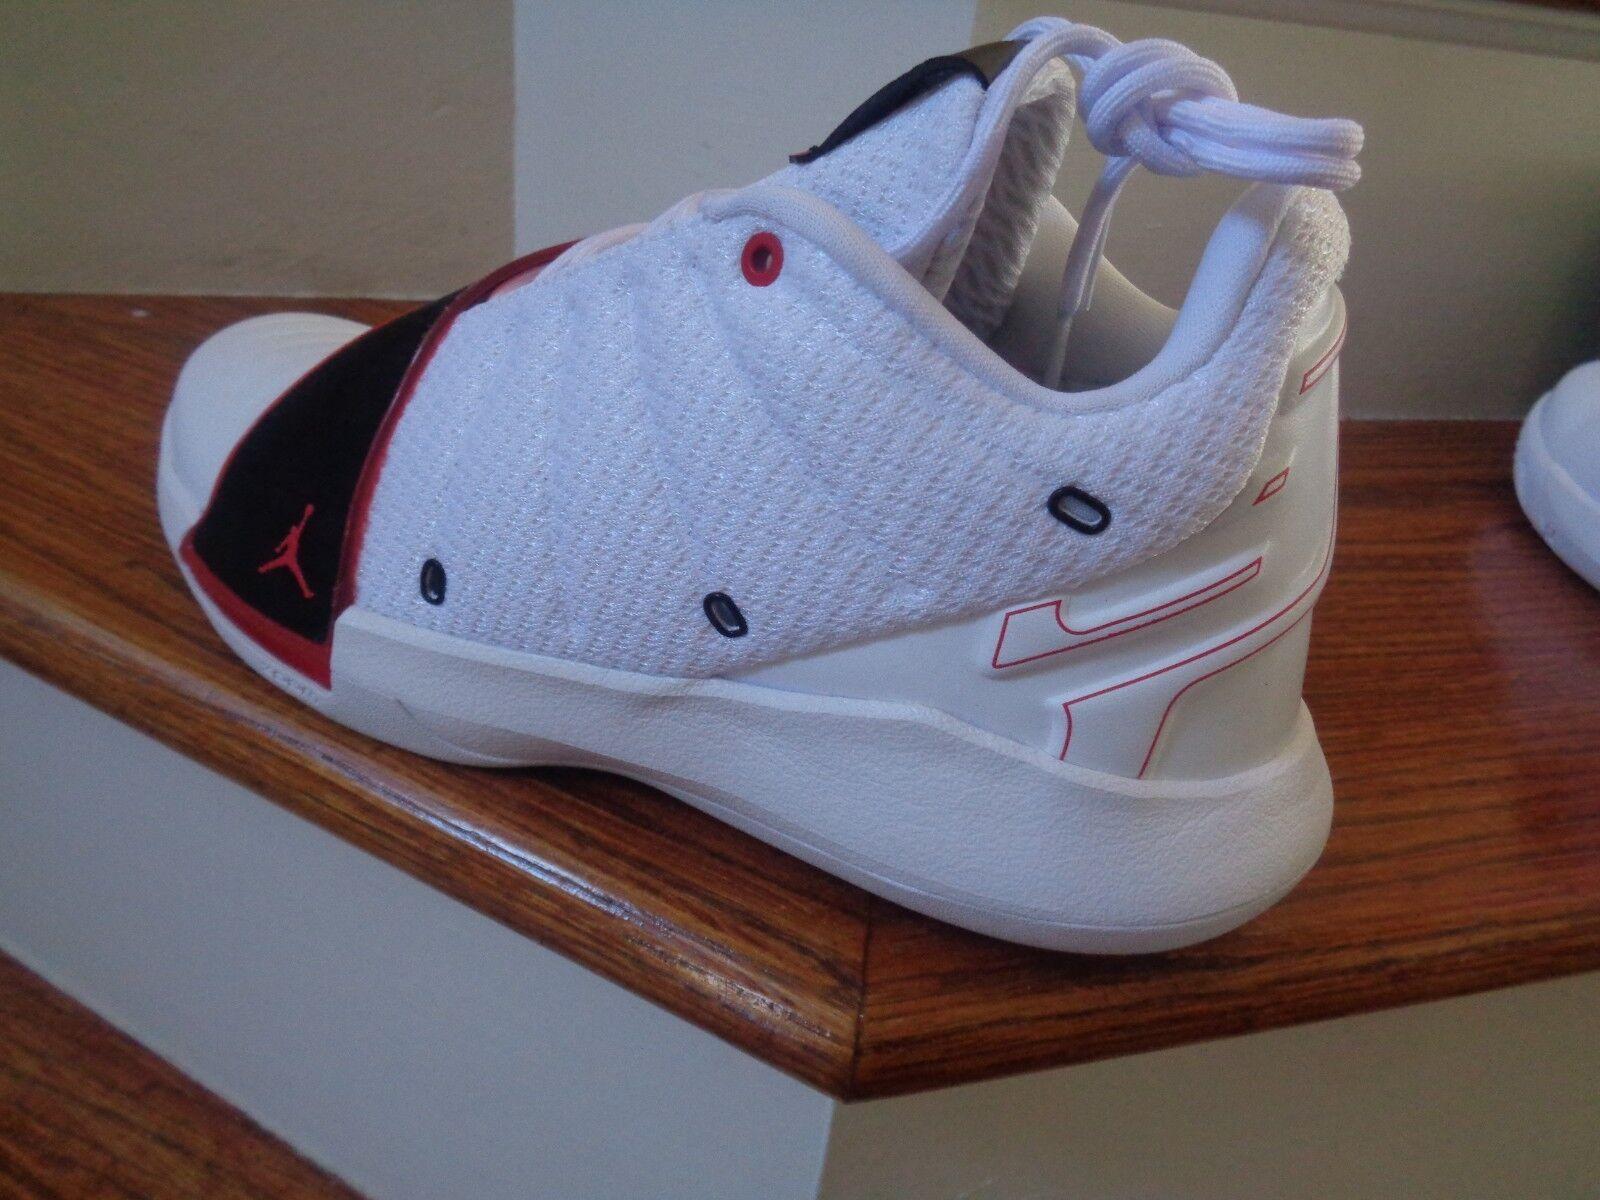 Nike Air Jordan  CP3 XI Men's Basketball shoes, AA1272 101 Size 11.5 NEW